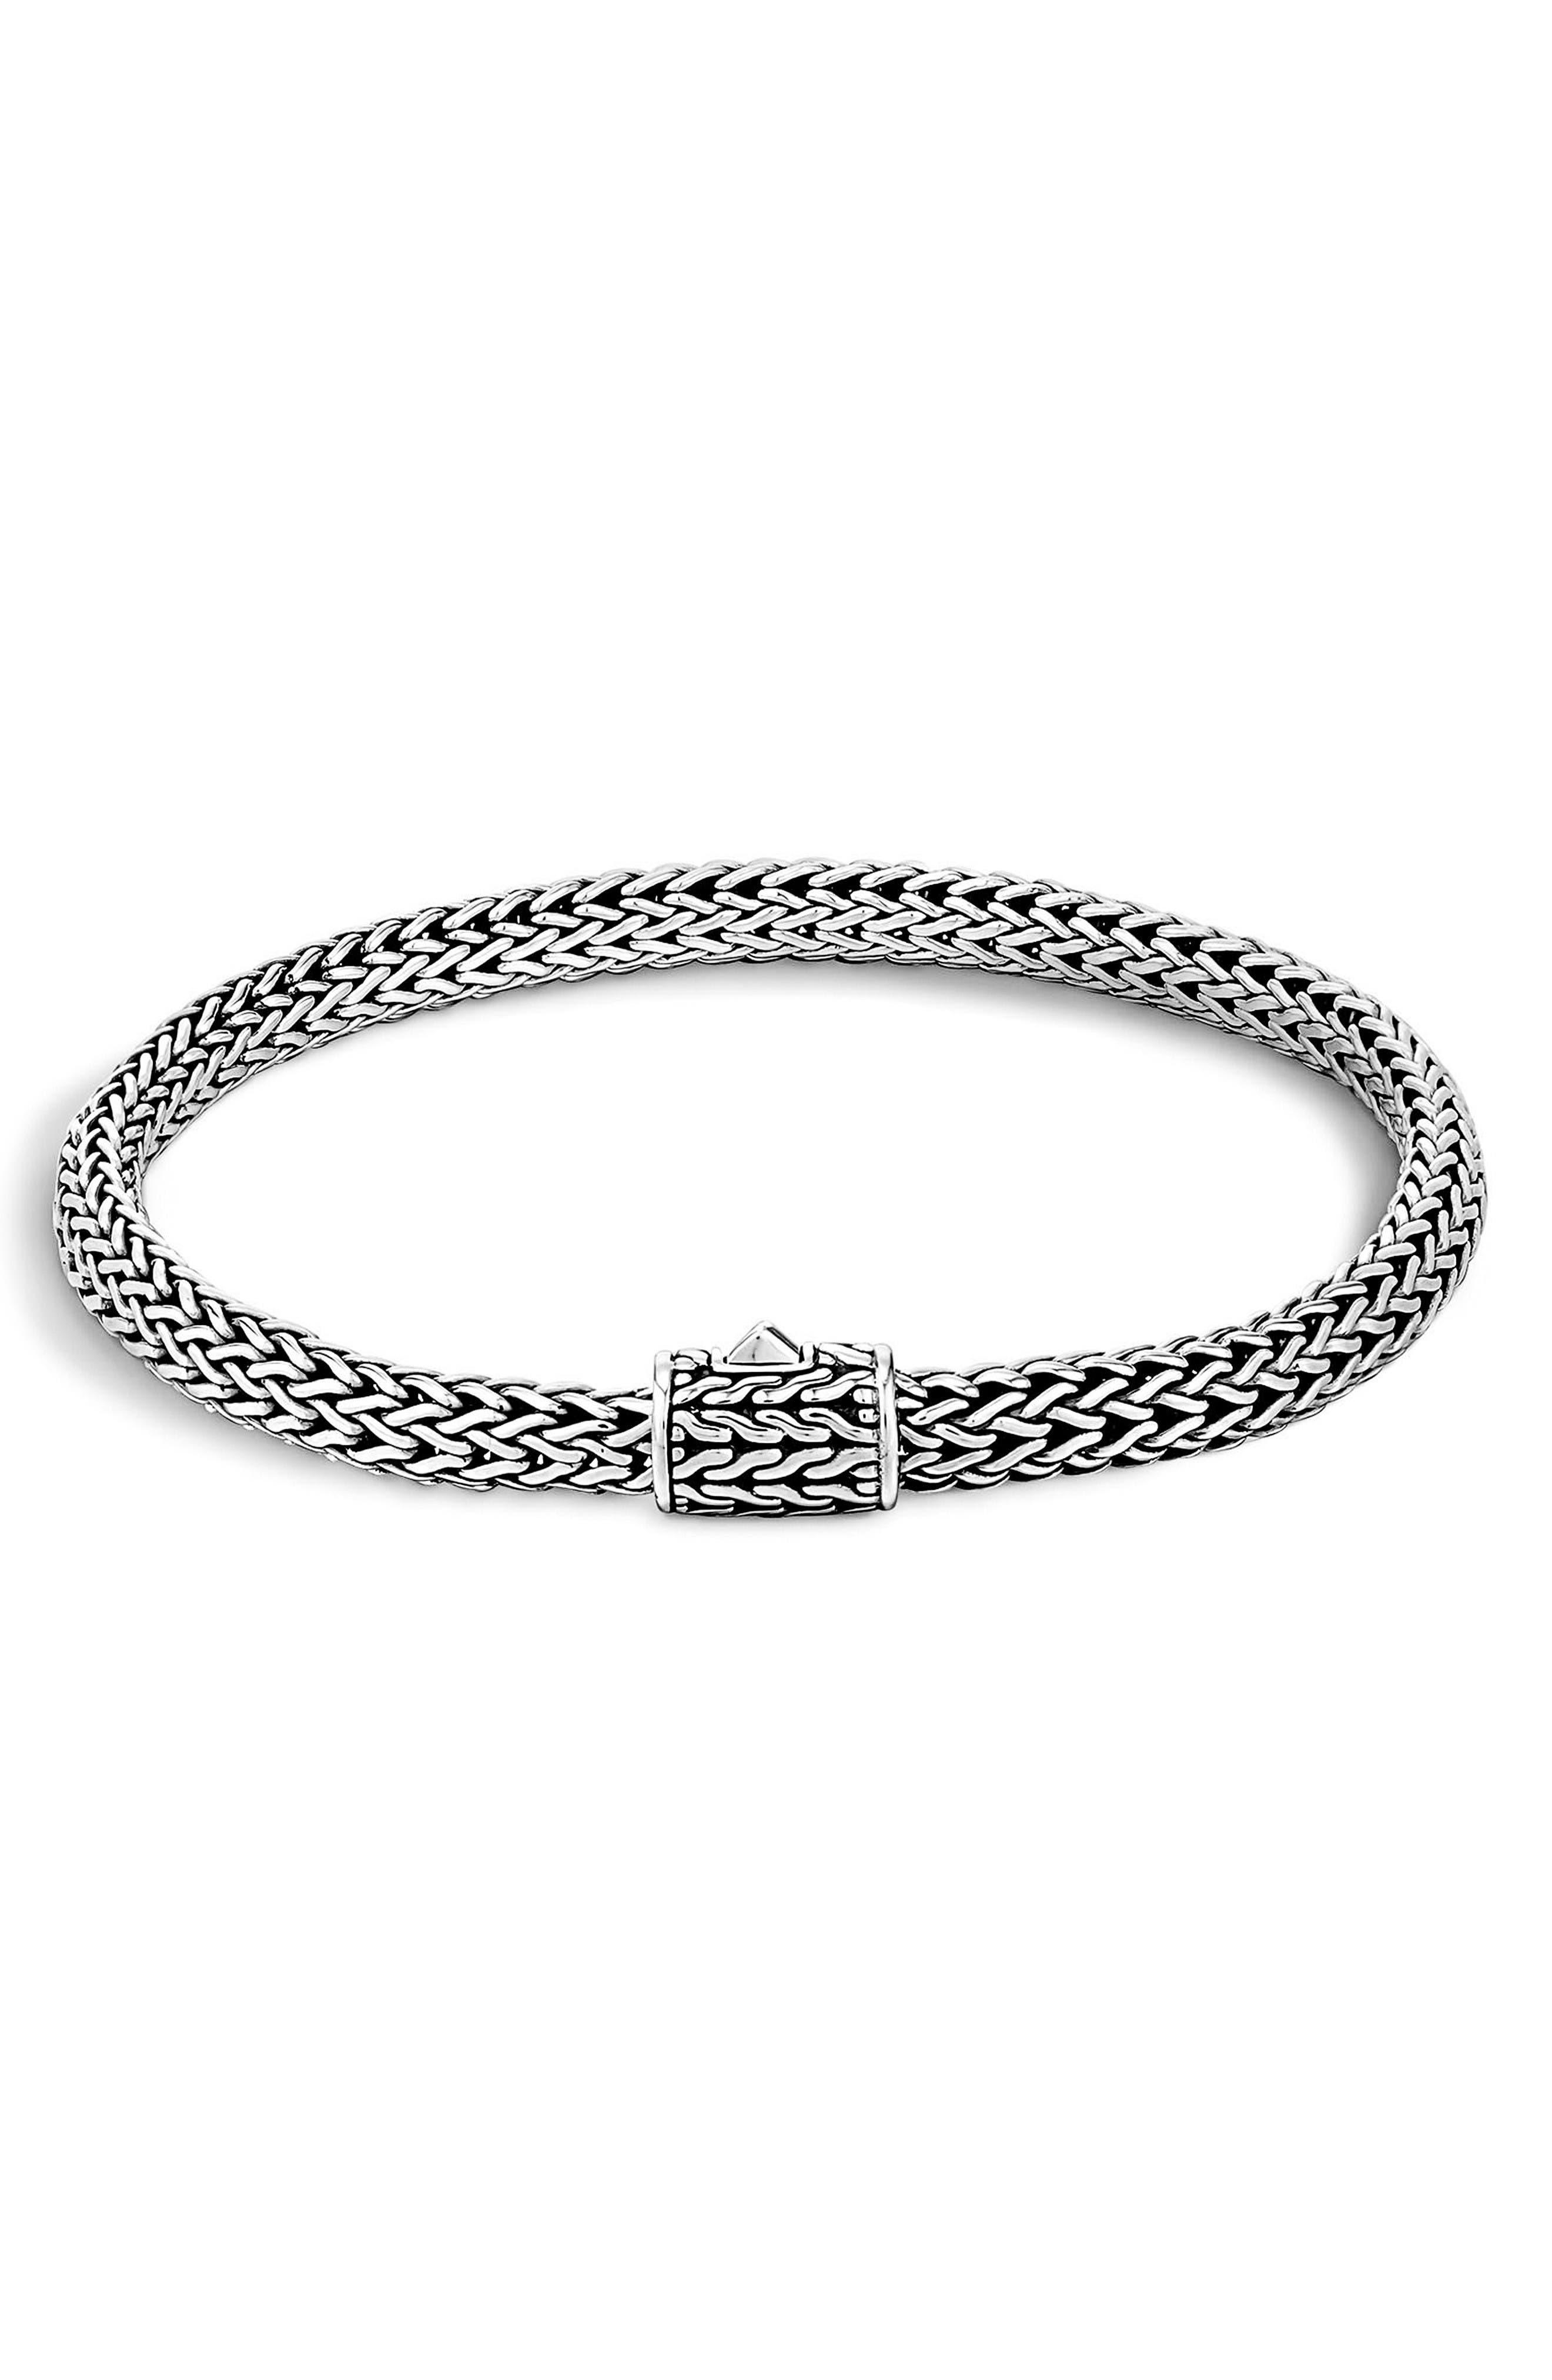 Main Image - John Hardy Classic Chain Bracelet